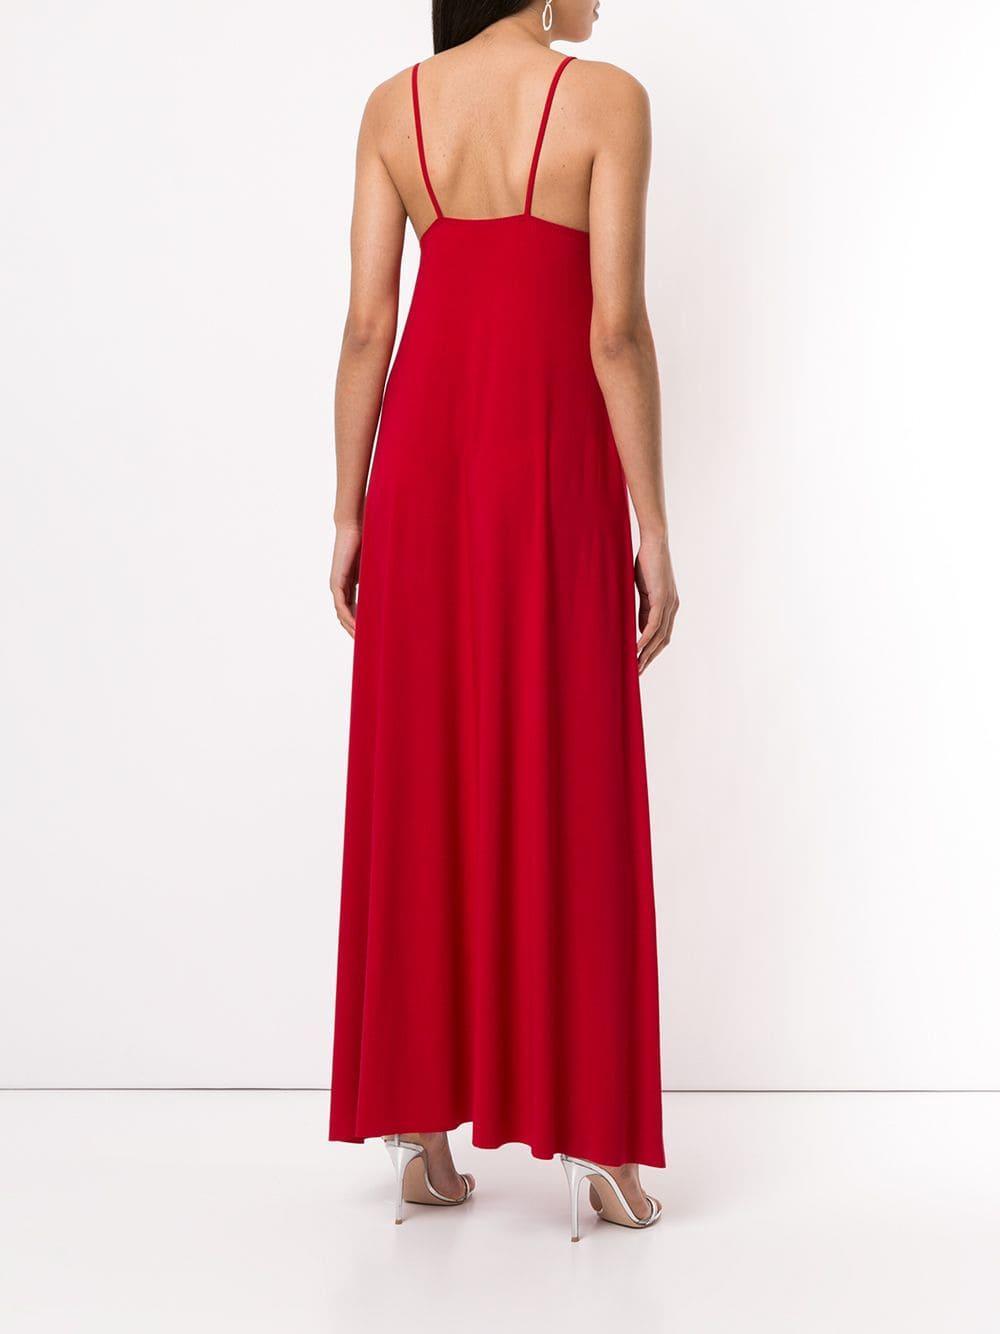 70af78cca10 Norma Kamali - Red Long Slip Dress - Lyst. View fullscreen